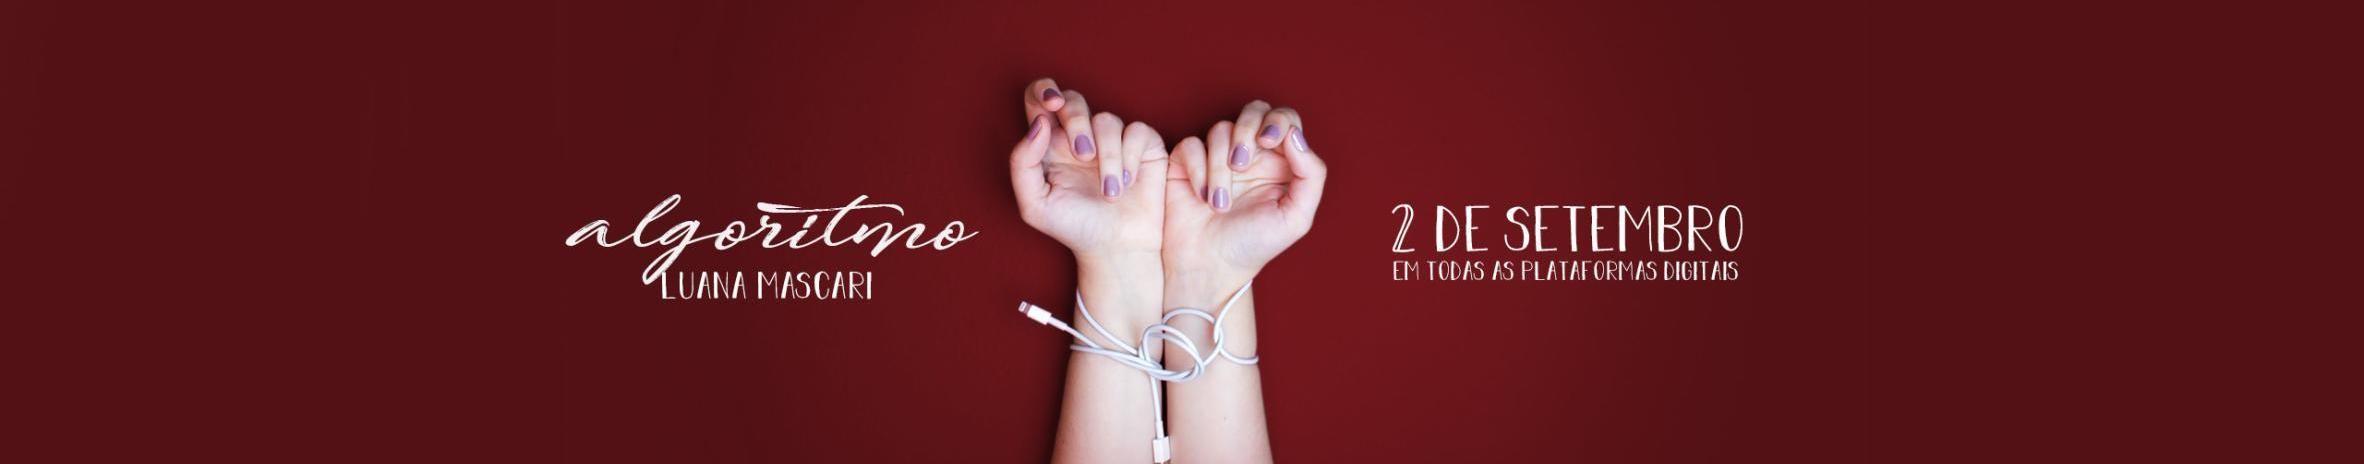 Imagem de capa de Luana Mascari